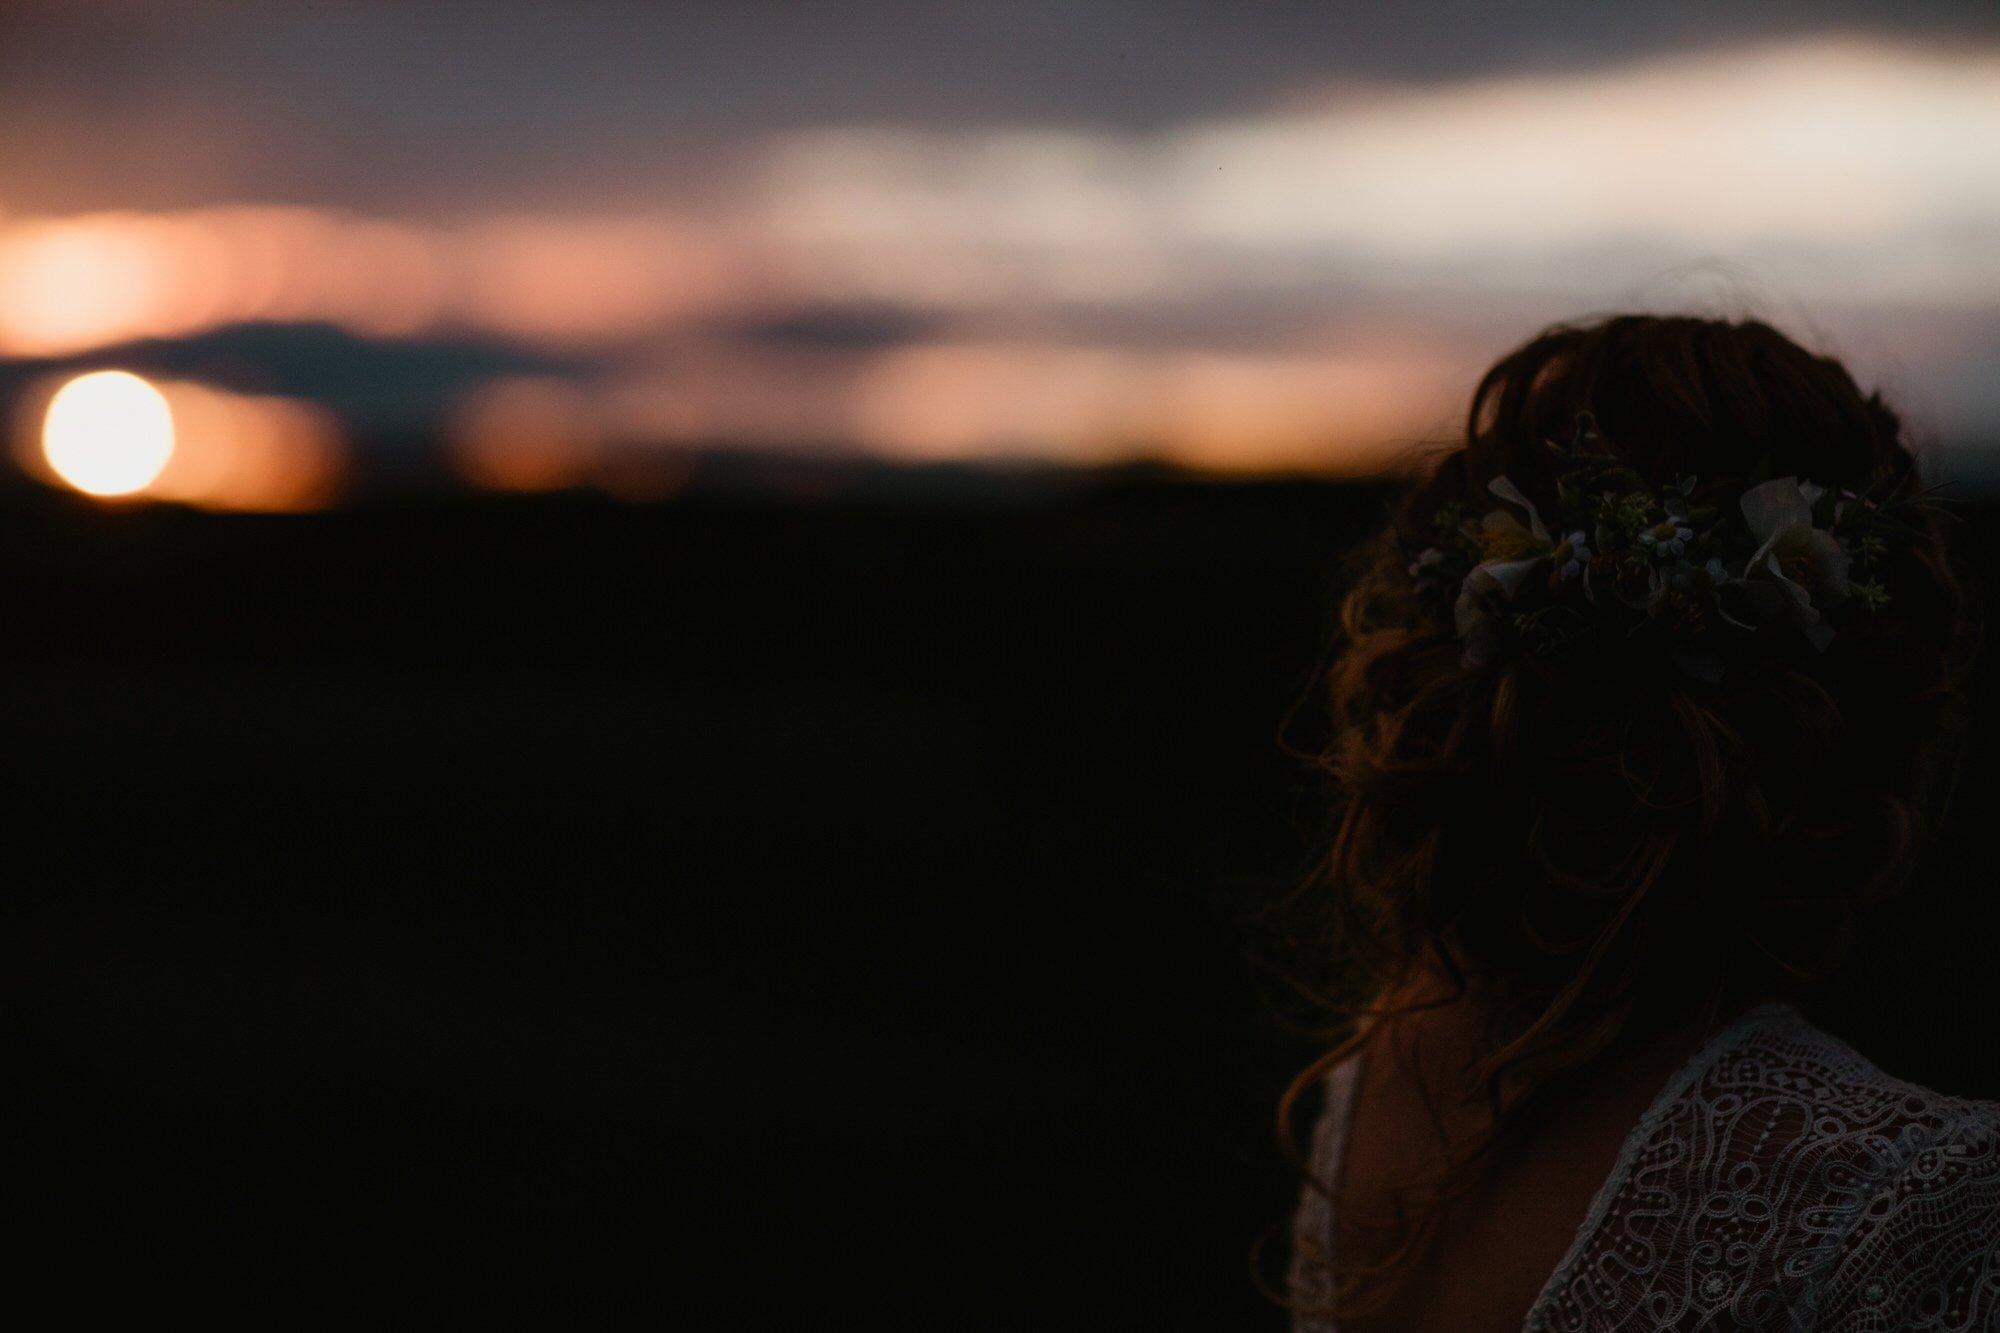 071 TIN SHED KNOCKRAICH WEDDING AUSTRIAN SCOTTISH ZOE ALEXANDRA PHOTOGRAPHY